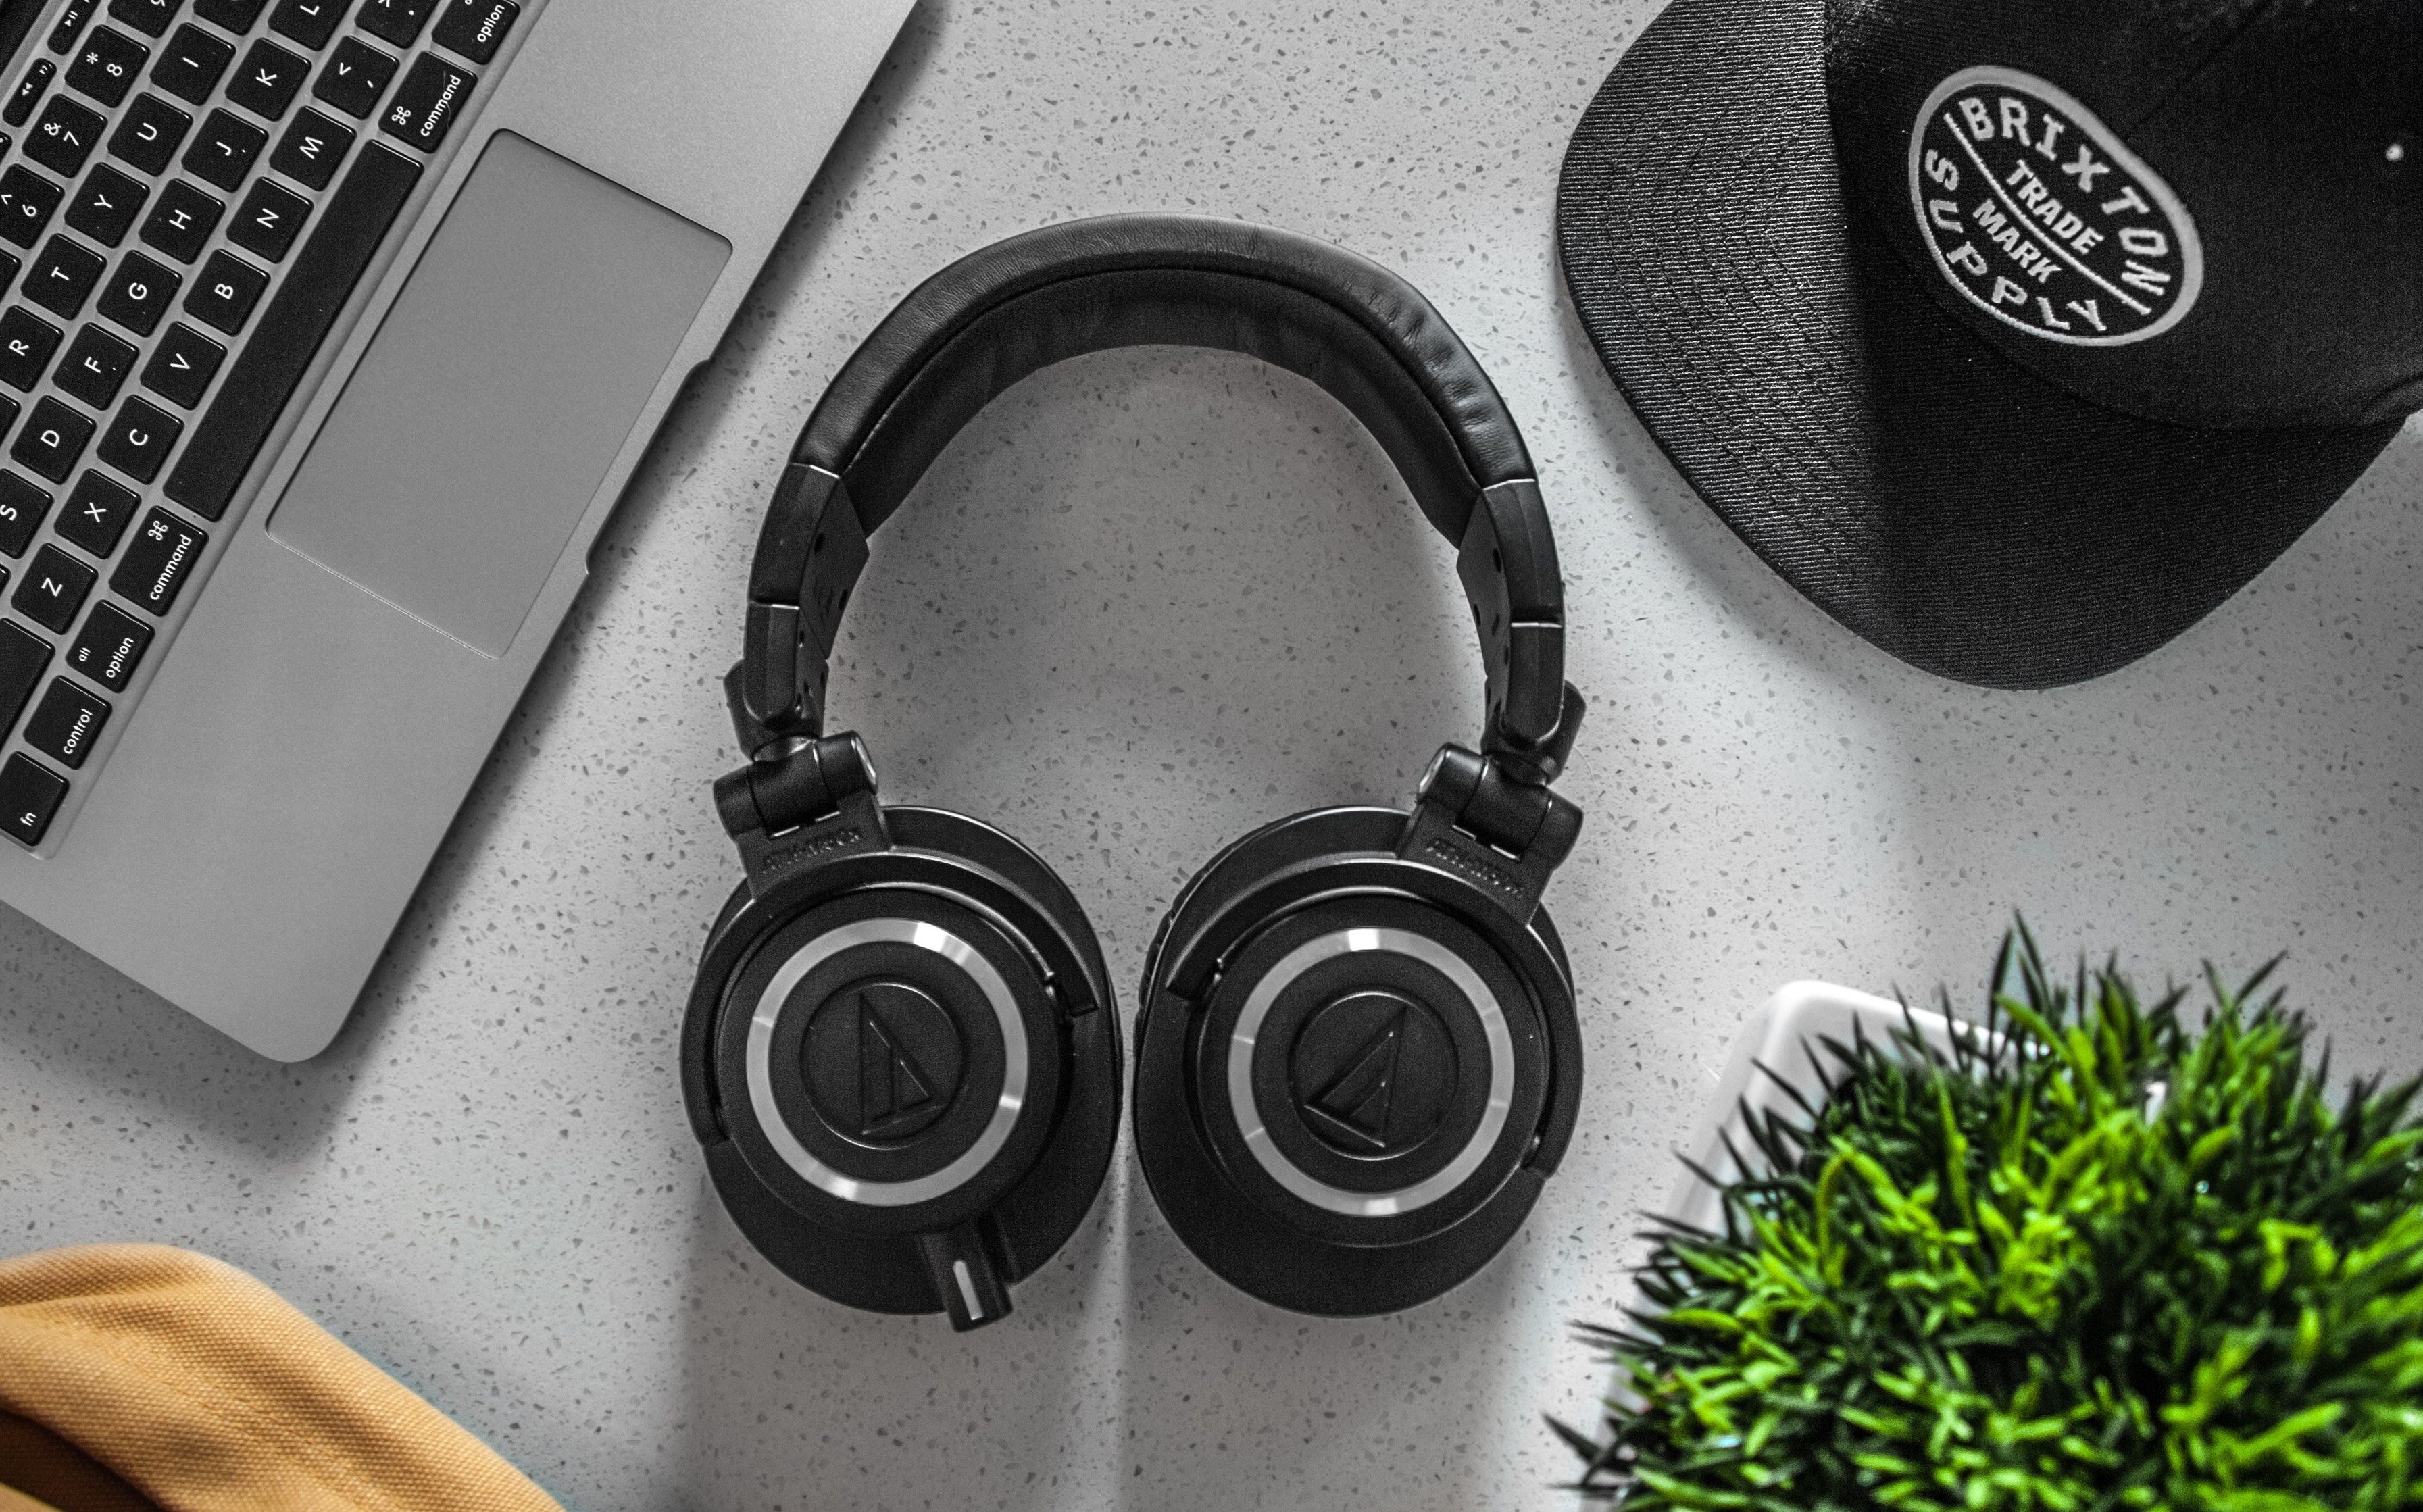 Tips For Choosing The Best Wireless Headphones